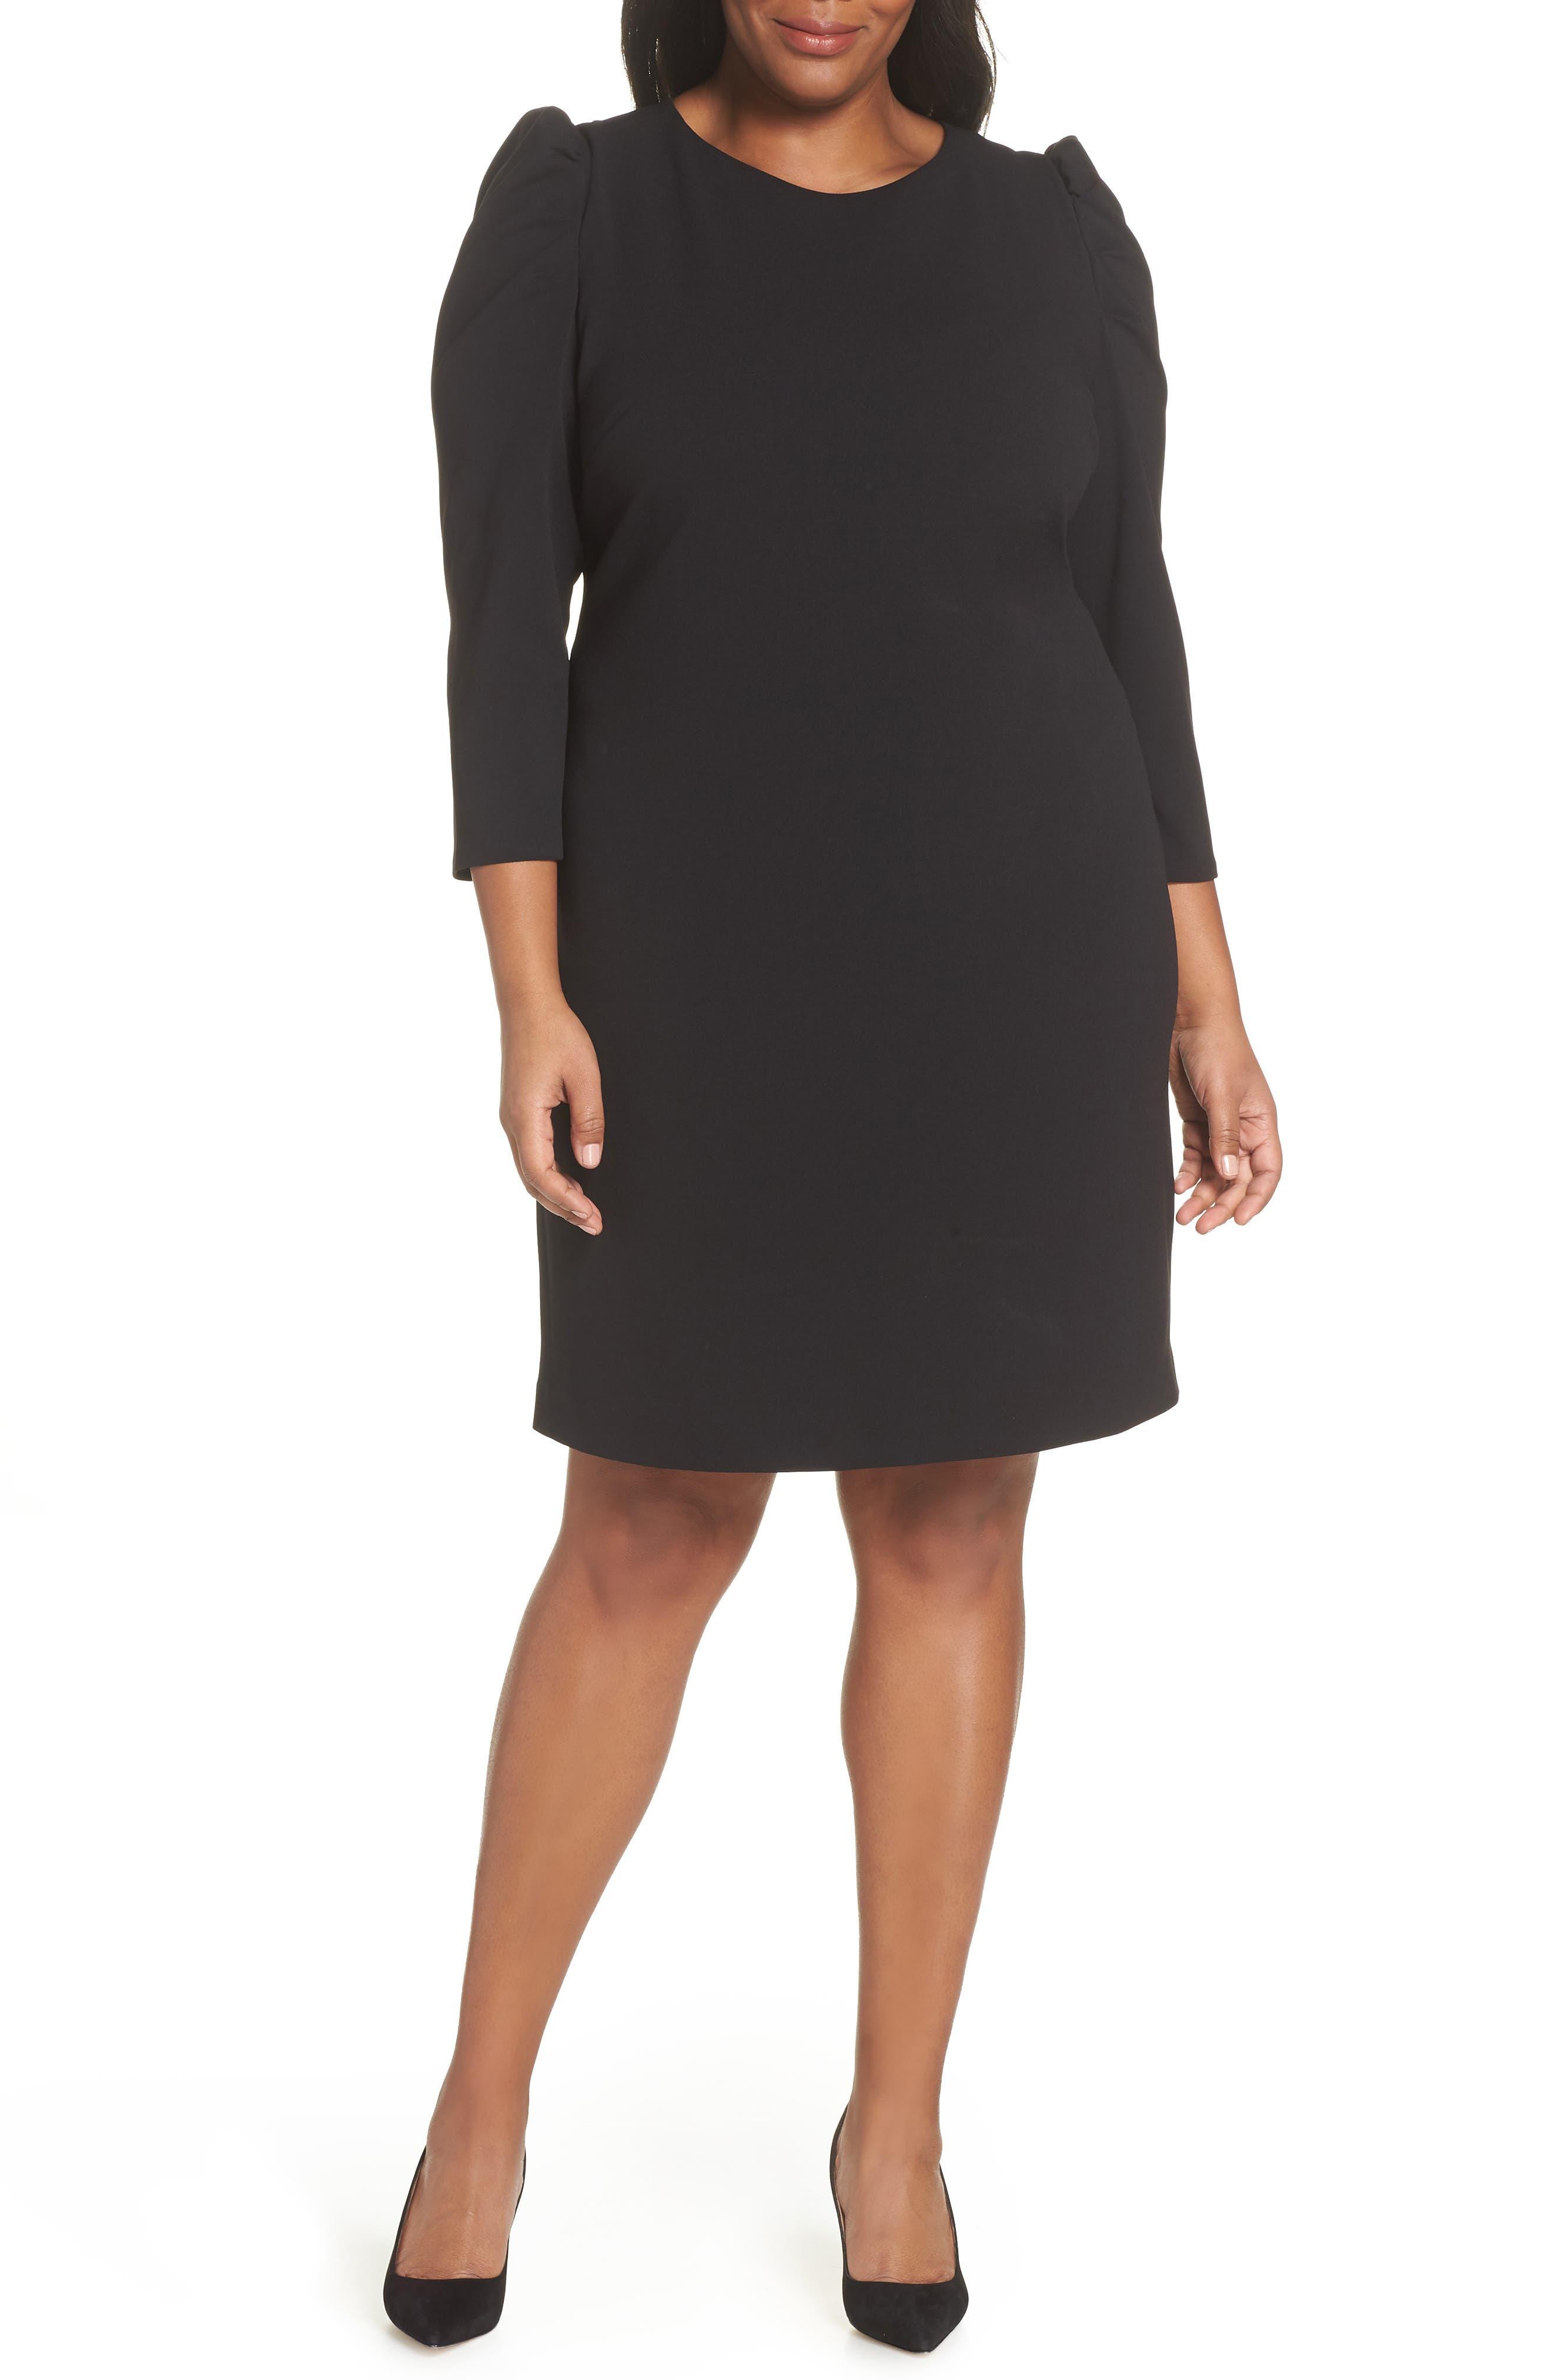 VINCE CAMUTO Puff Shoulder Shift Dress, Main, color, 001